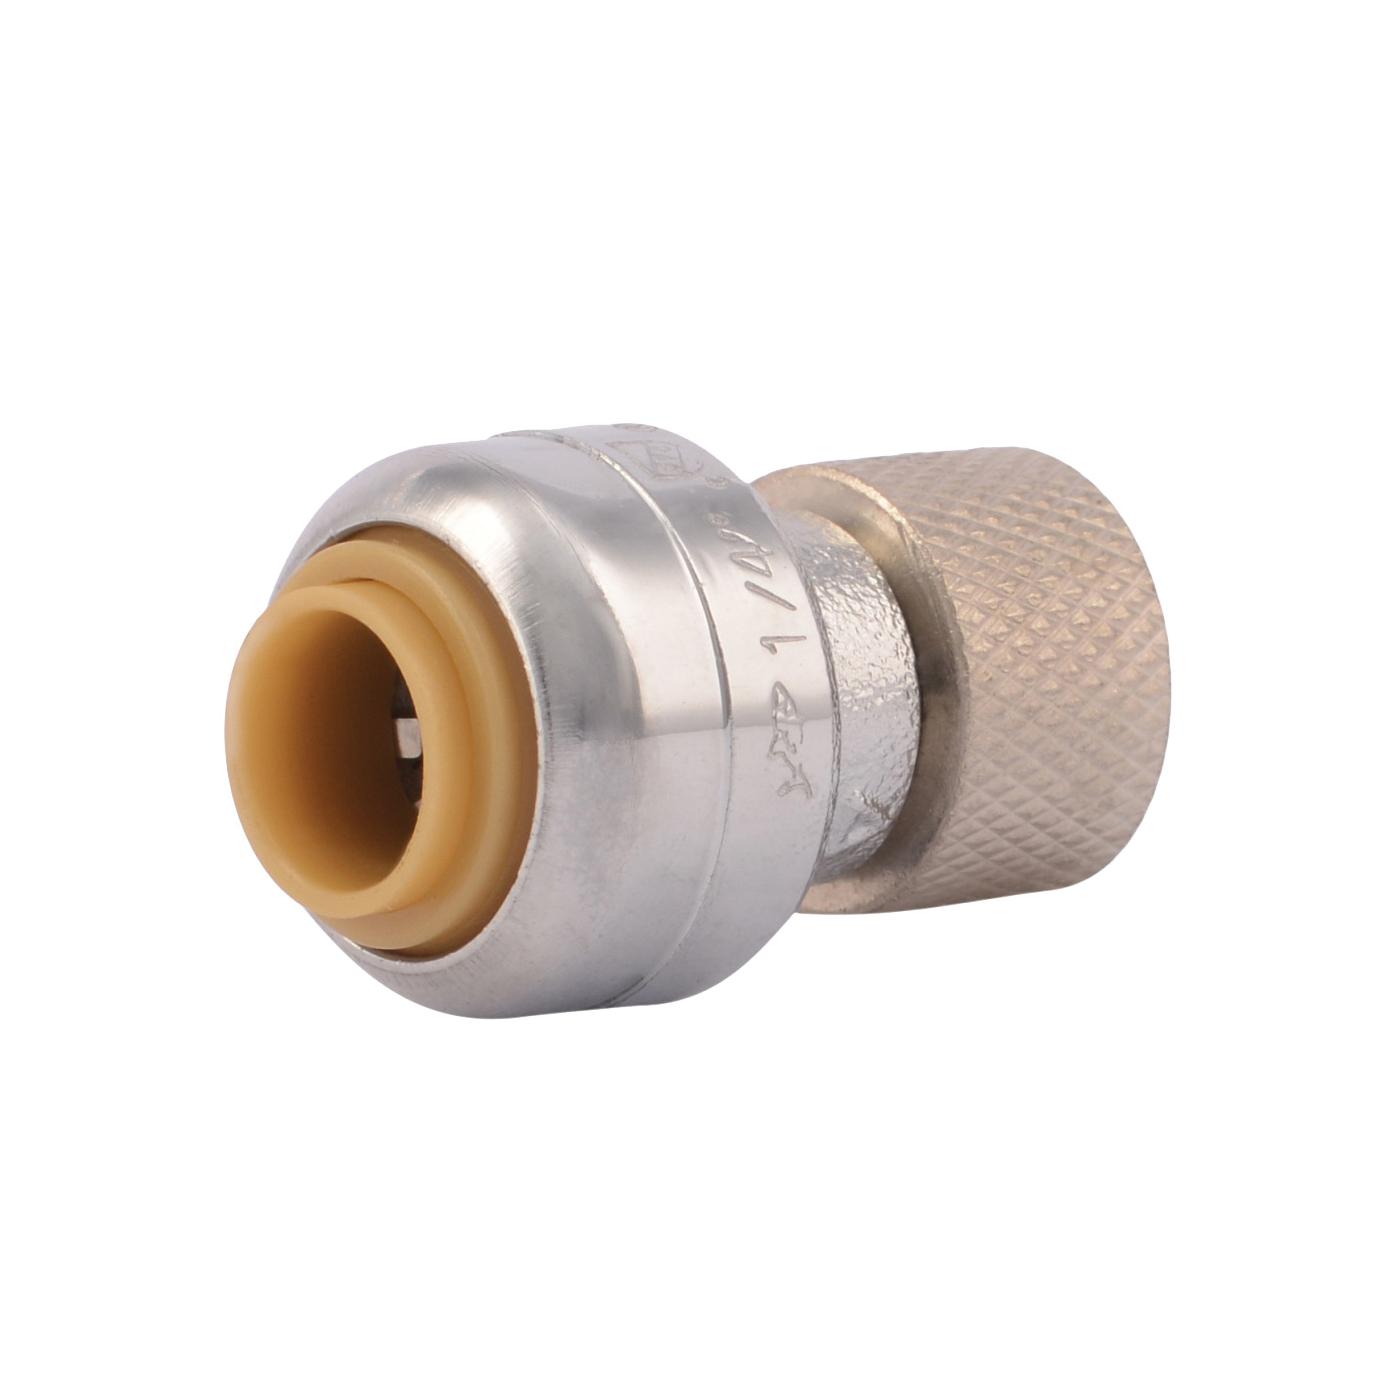 Picture of SharkBite U3523LFA Connector, 1/4 in Compression, 3/8 in Compression